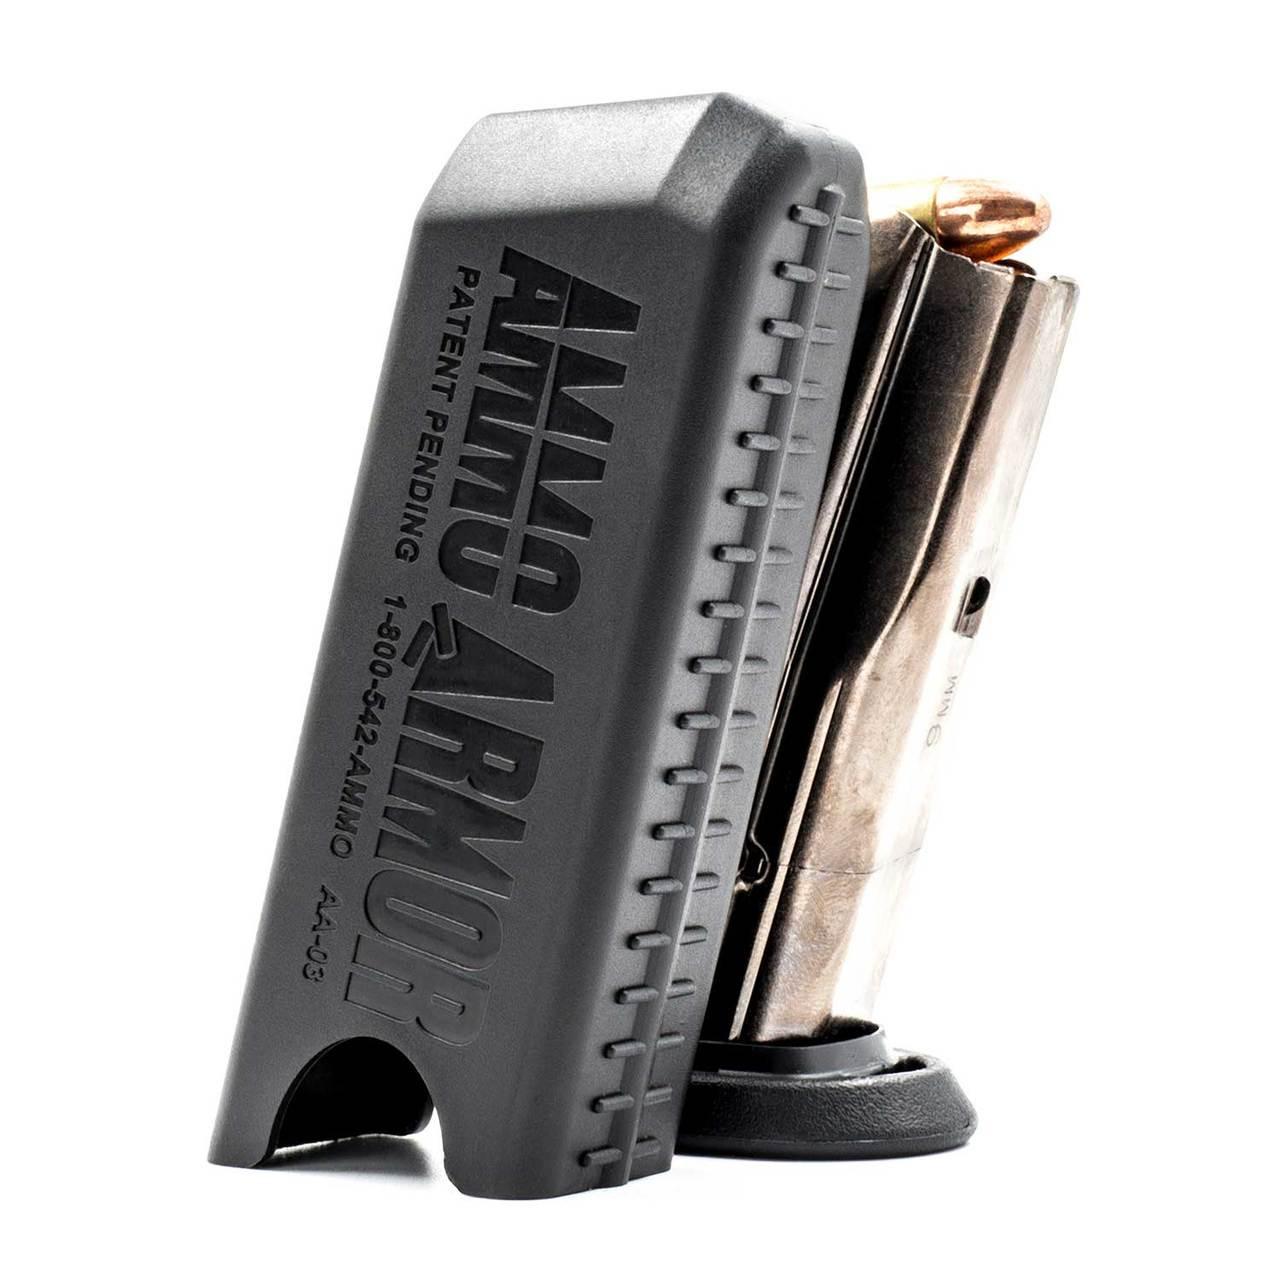 Beretta 92 Compact Ammo Armor